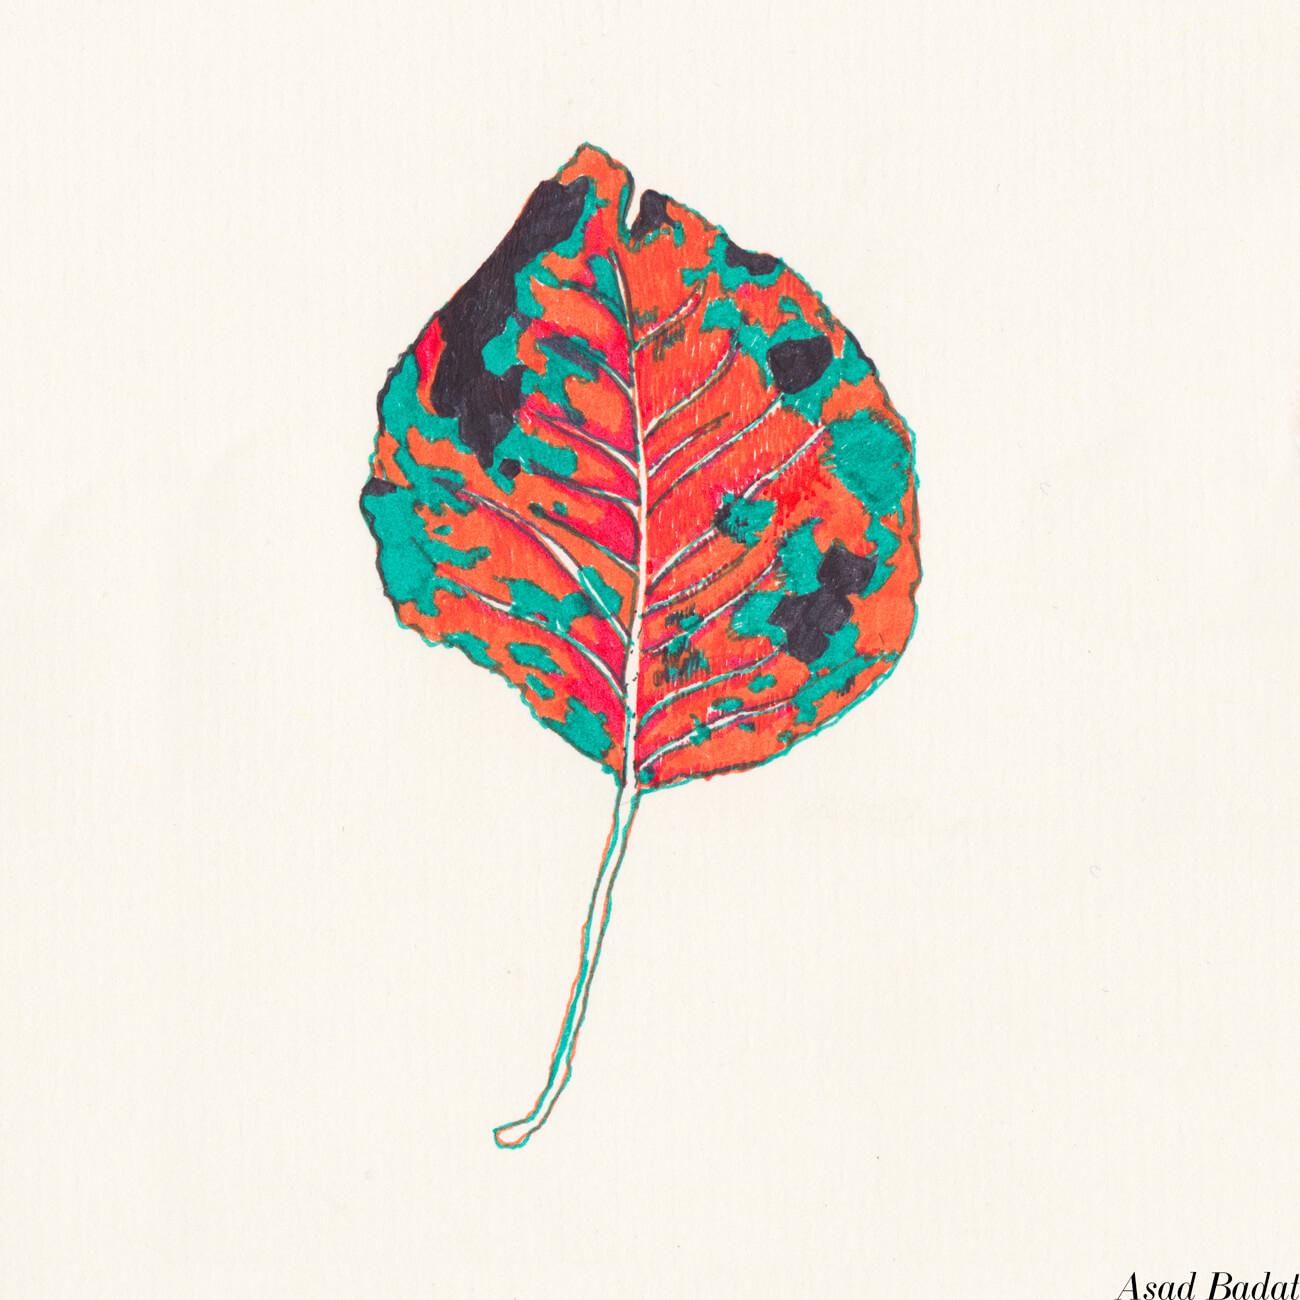 Asad-Badat-Autumn-Leaves-Drawing-1.jpg